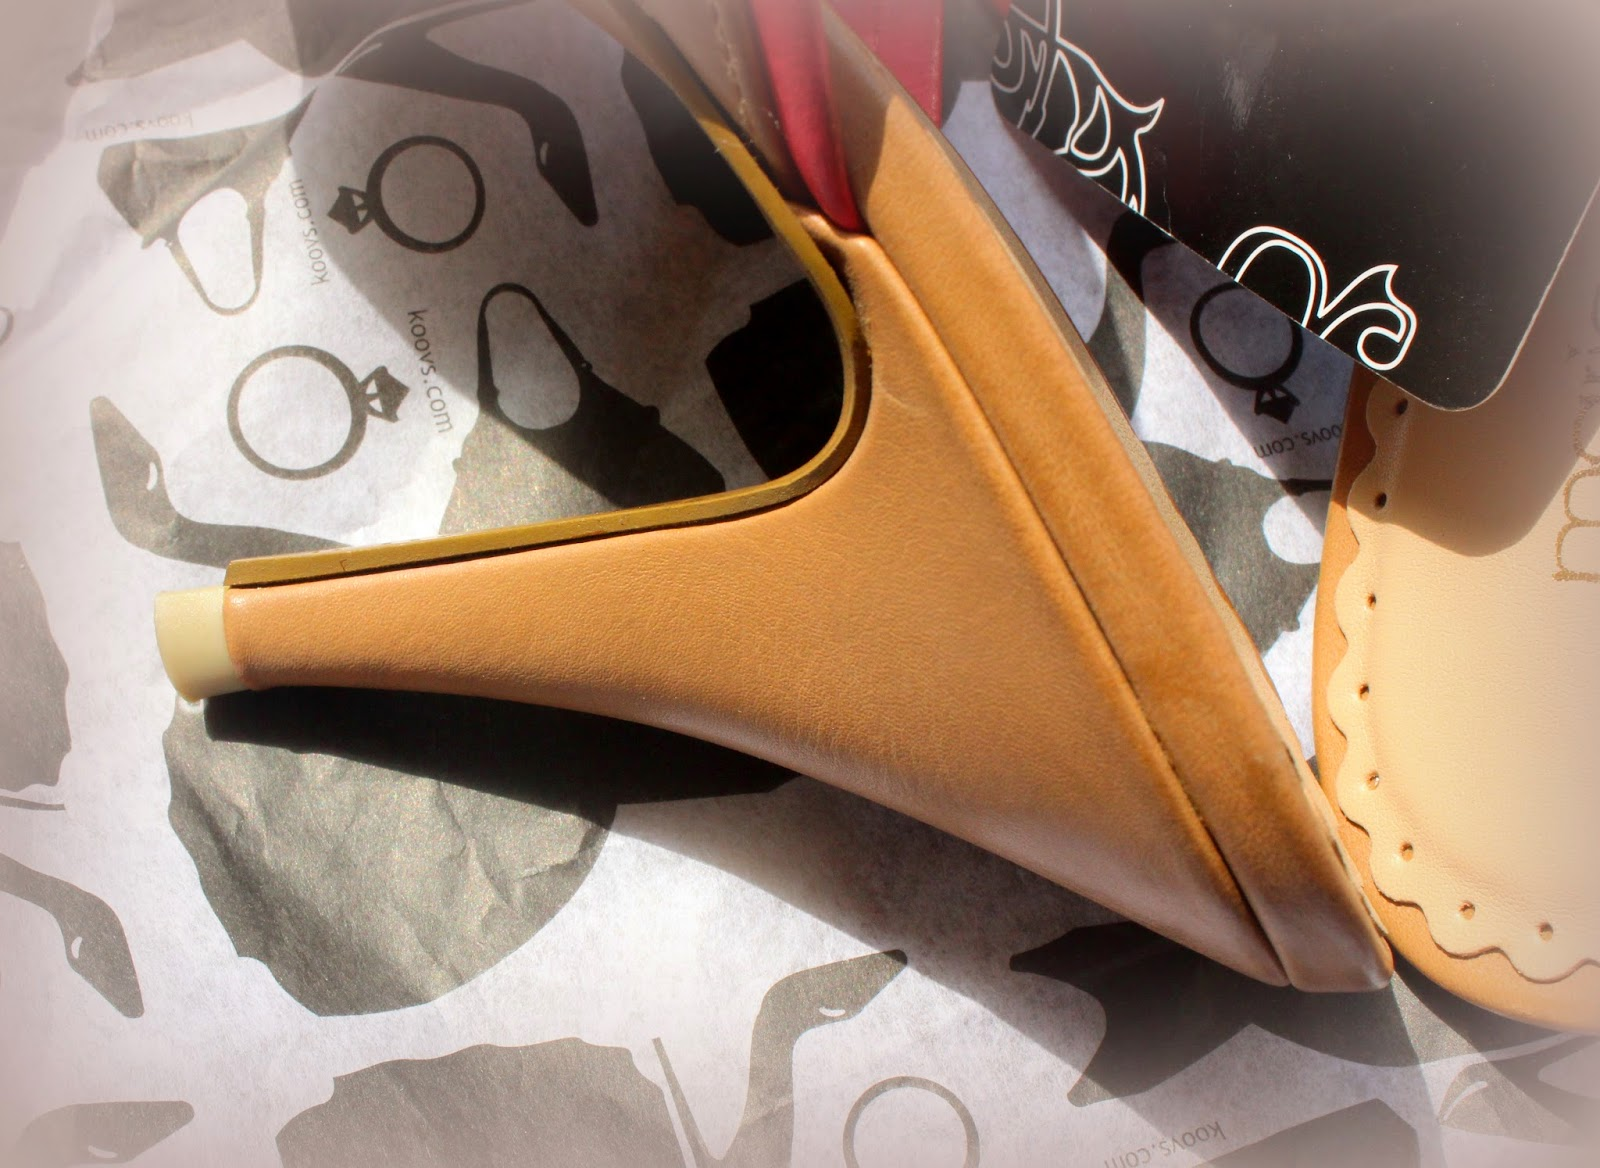 Bata Valen Black6 List Harga Terkini Dan Terlengkap Indonesia Sepatu Wanita Black 6516145 Ssu Shopped His Hers Summer Special Stylish And Comfortable Shoes